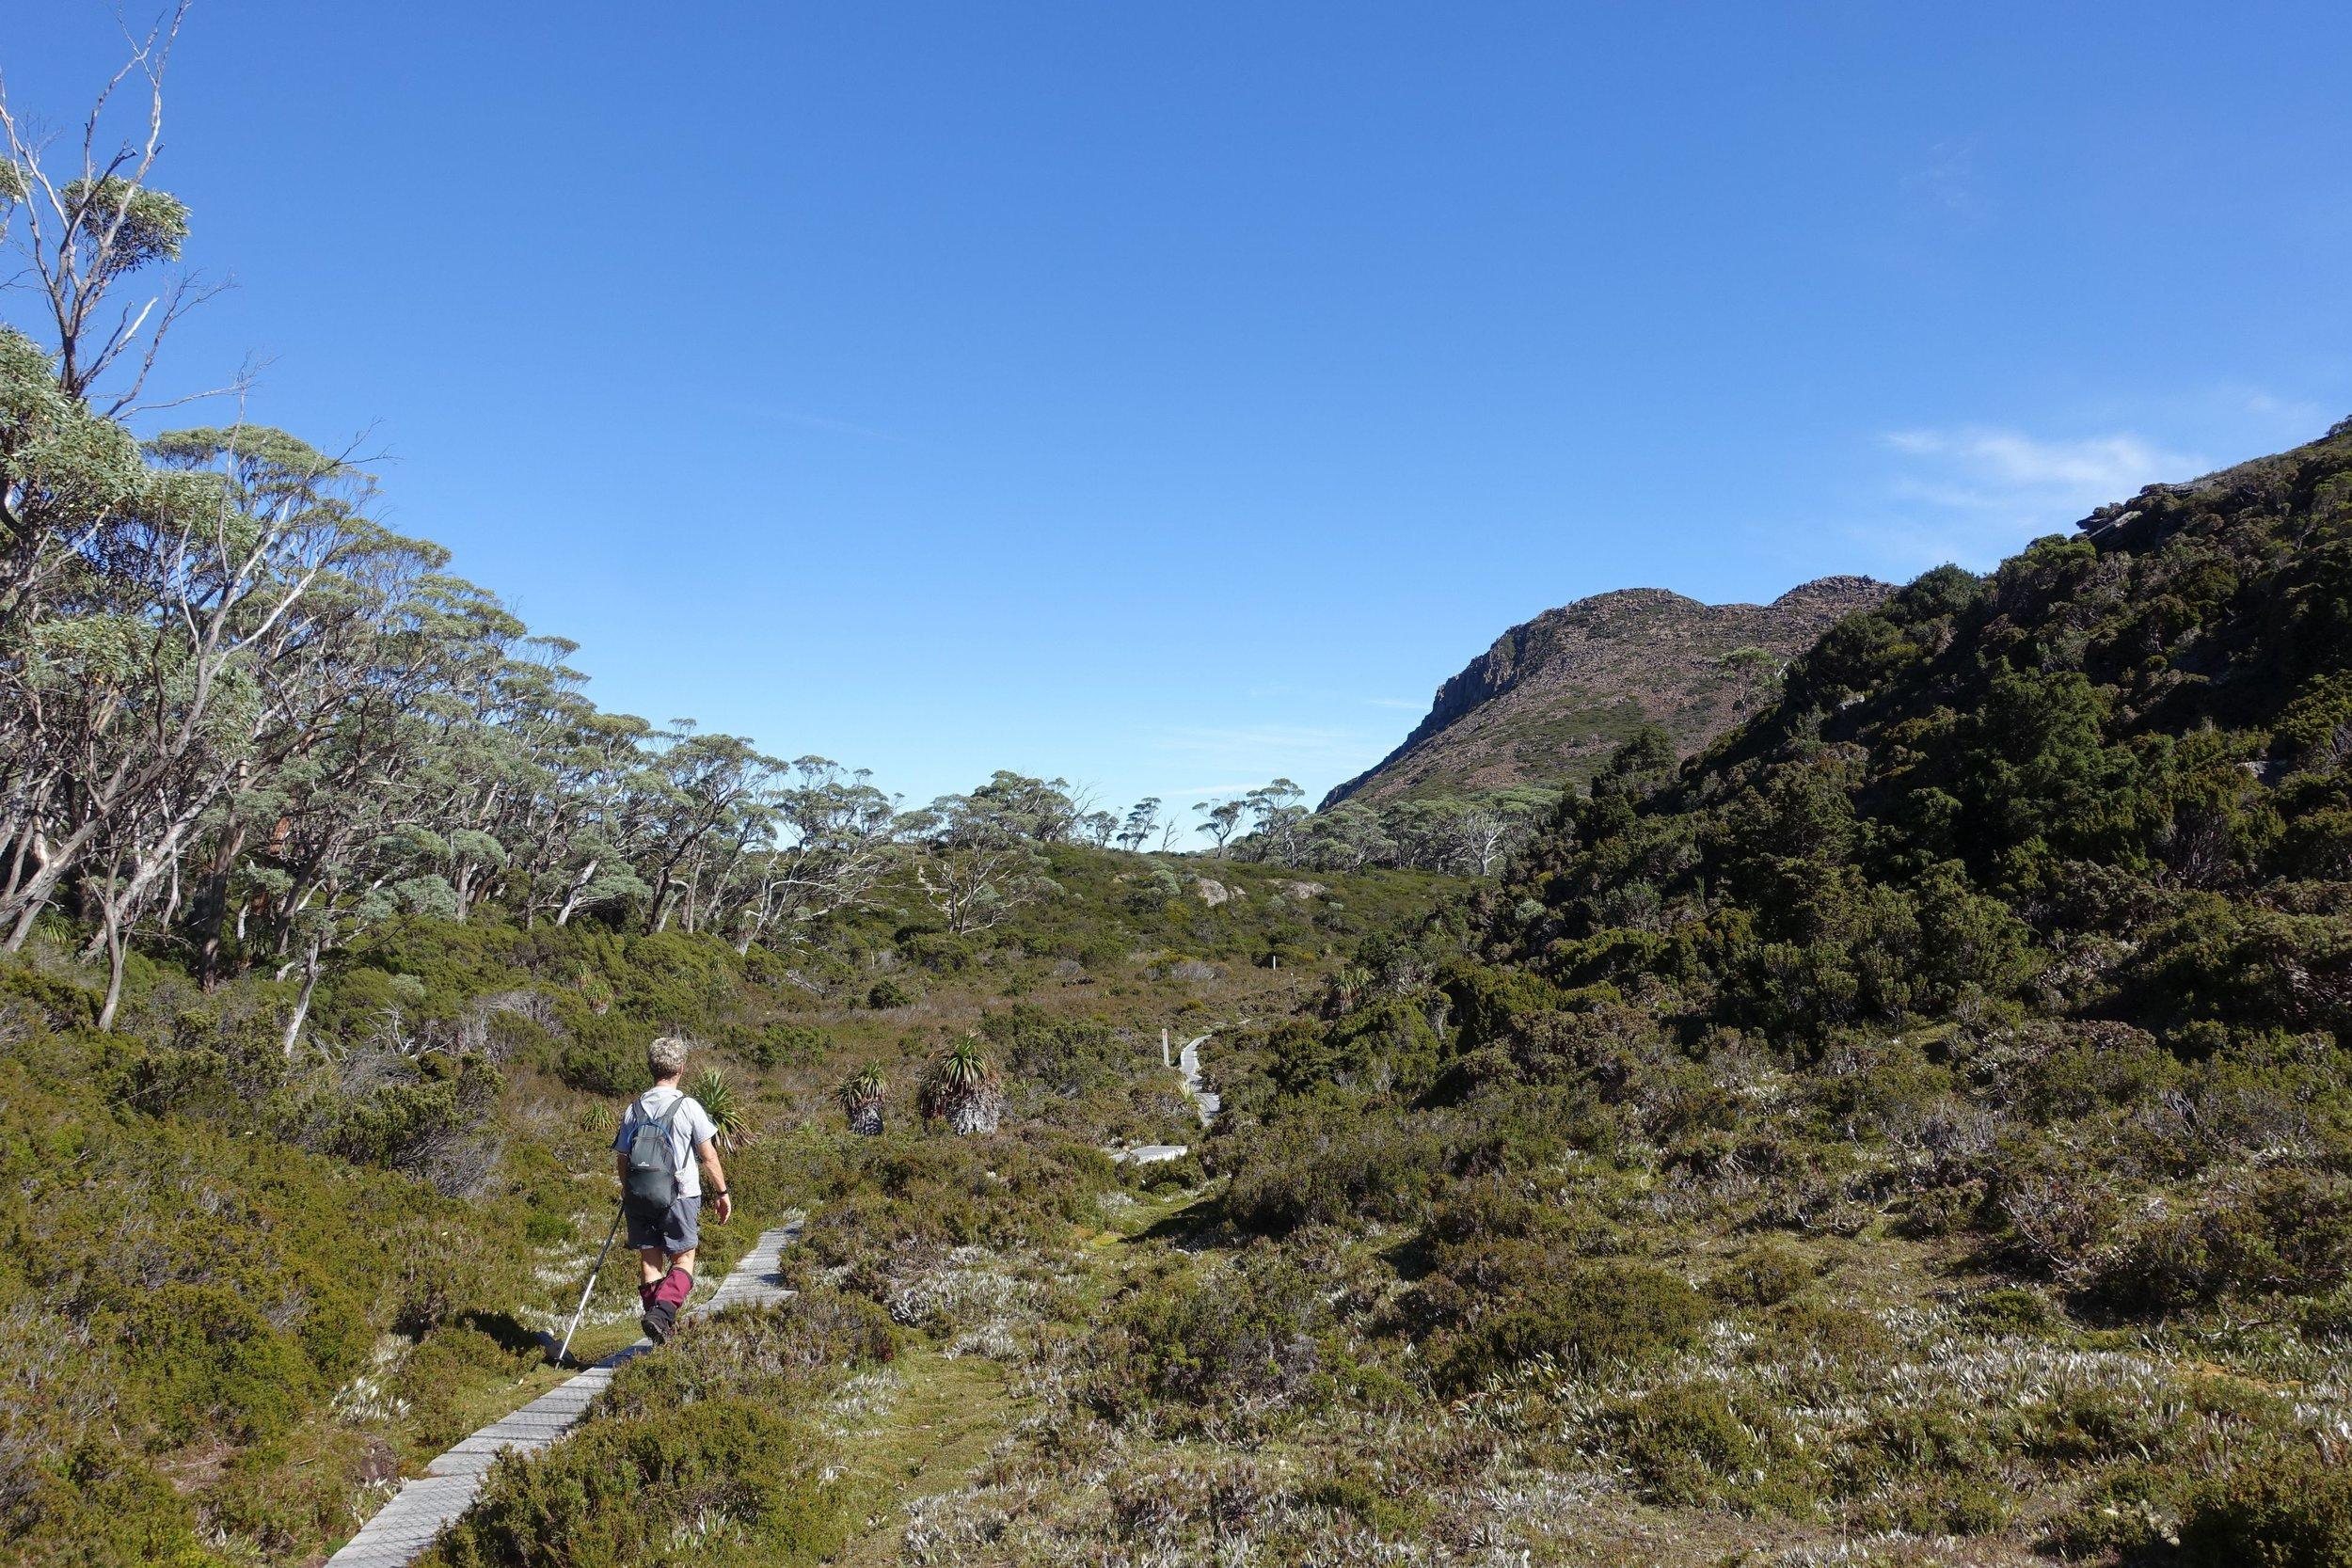 ascending towards mt hugel